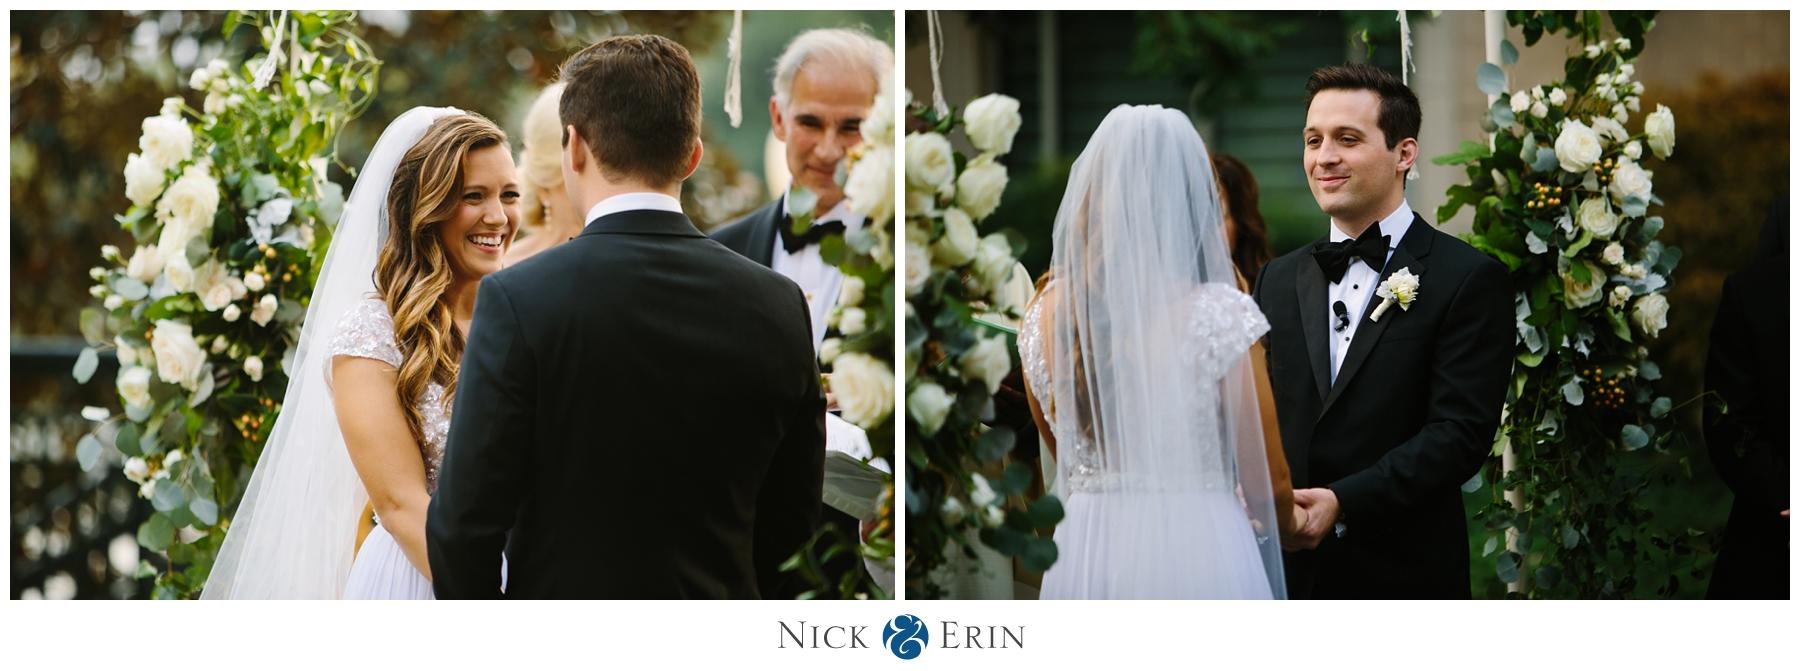 donner_photography_washington-dc-wedding_ariel-patrick_0054